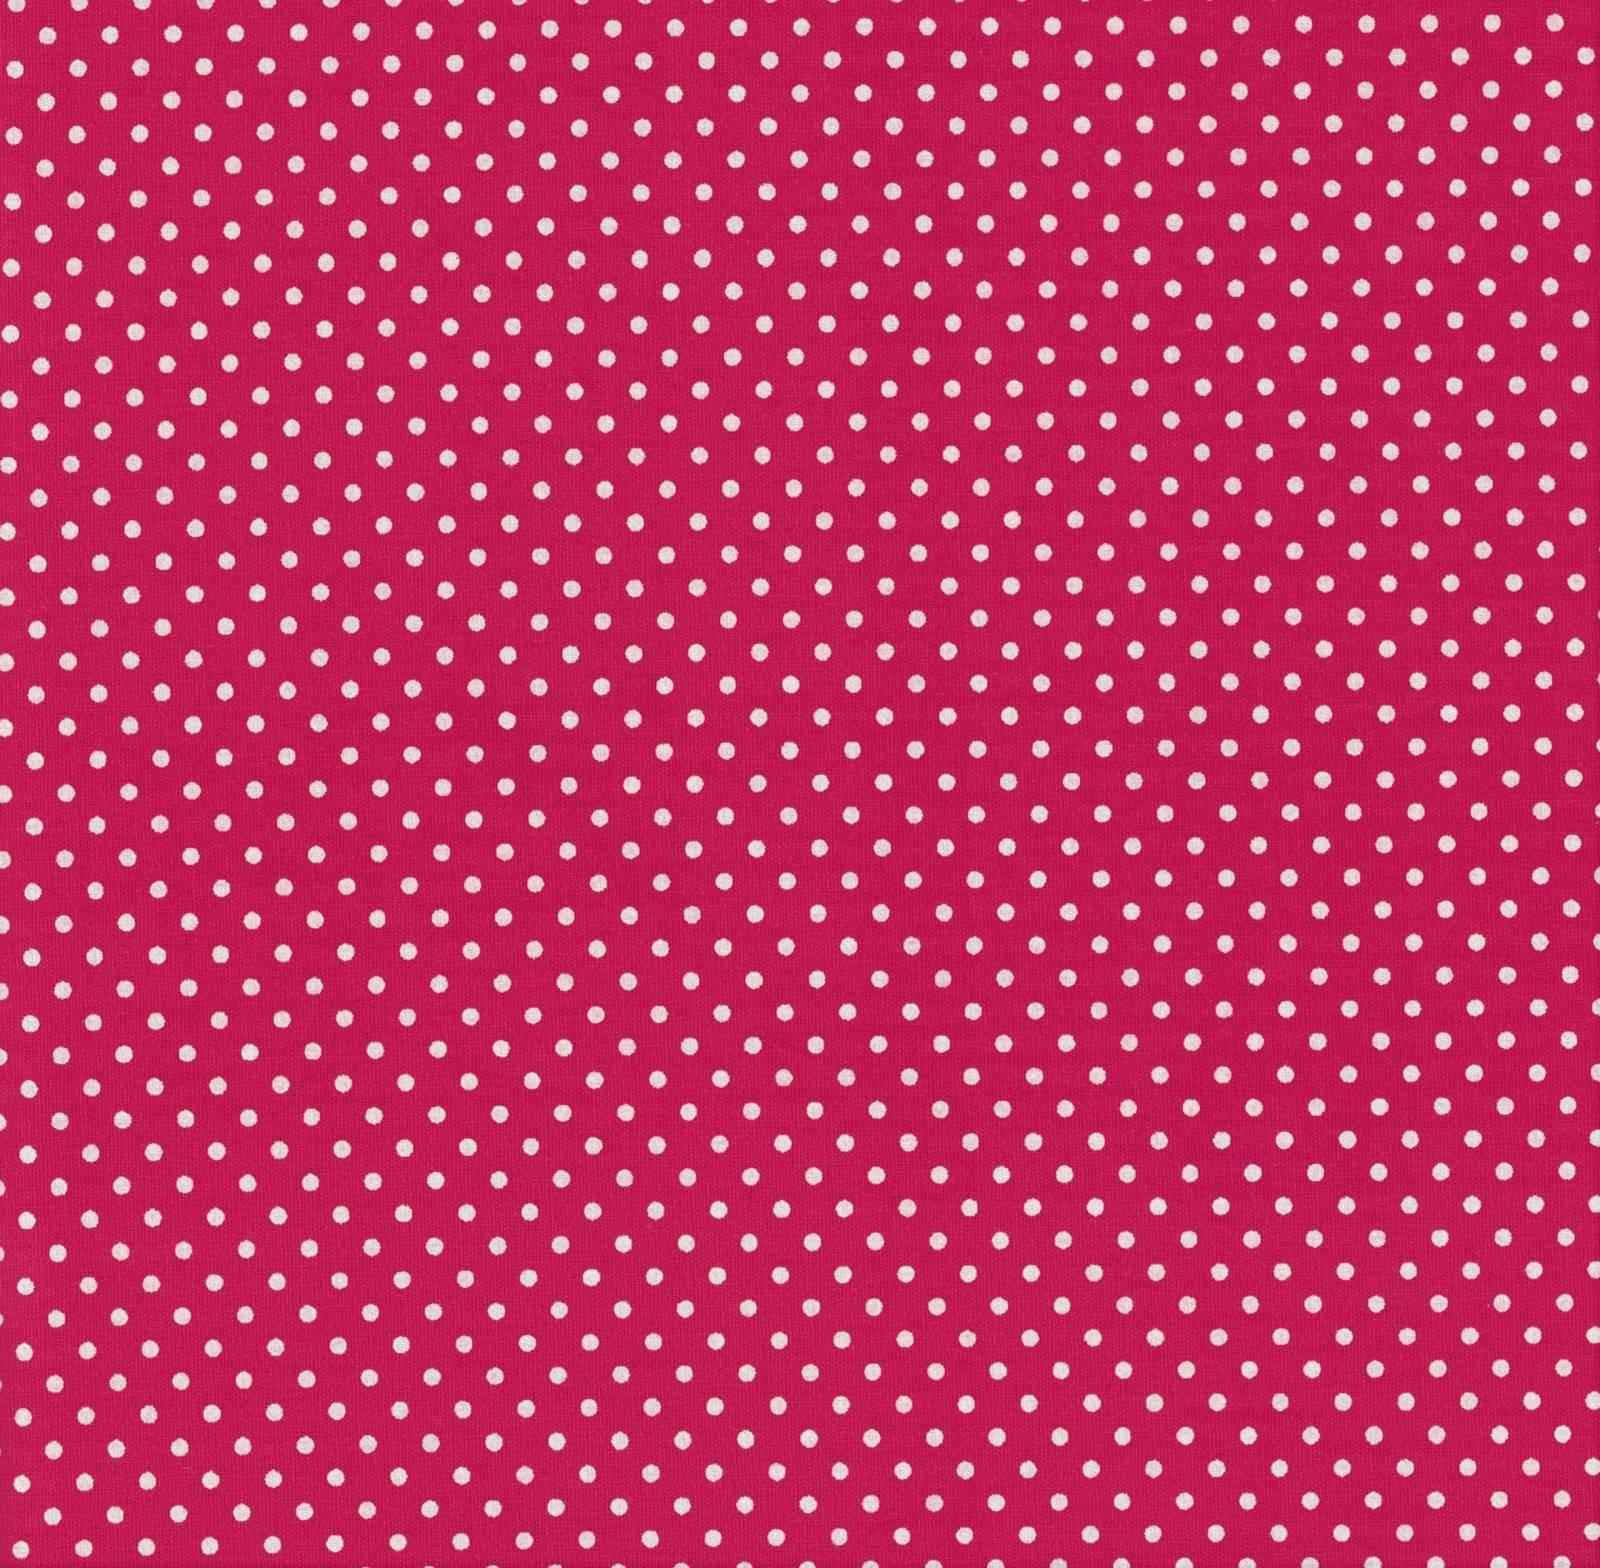 Poá pink Ref.1001 cor 108 - Armarinhos Nodari